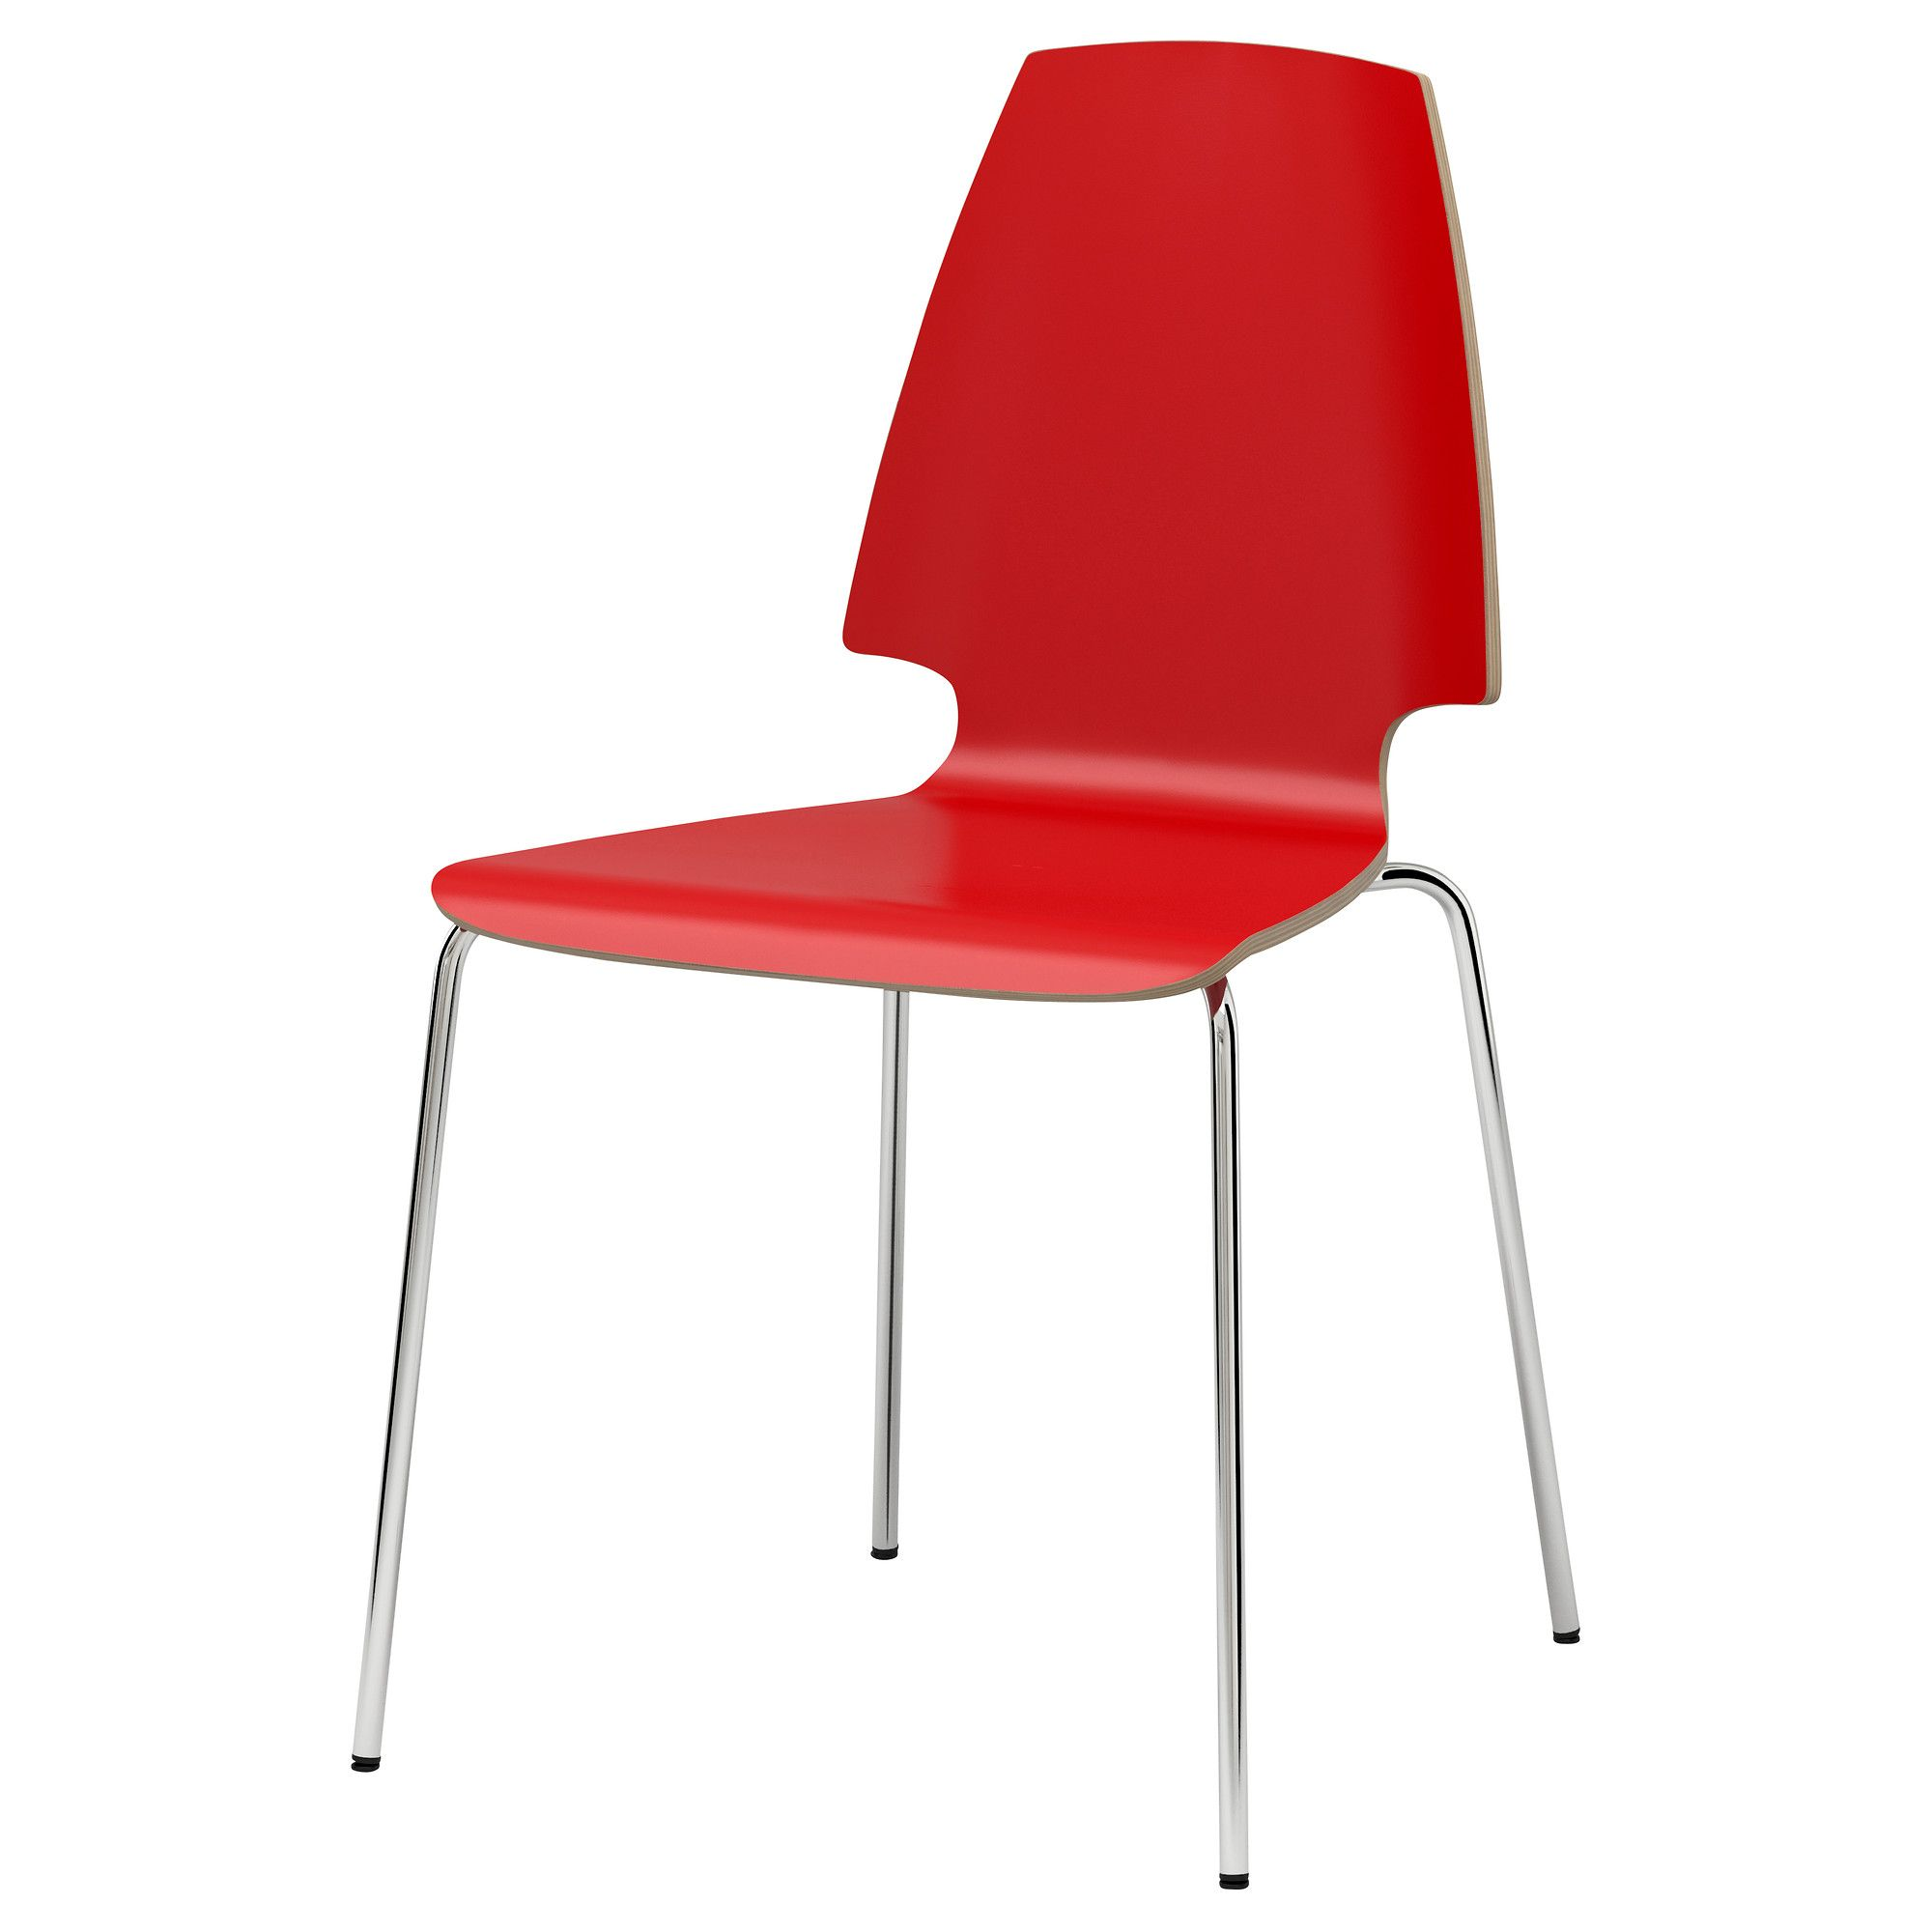 Vilmar Chair Red Chrome Plated Ikea 150 00